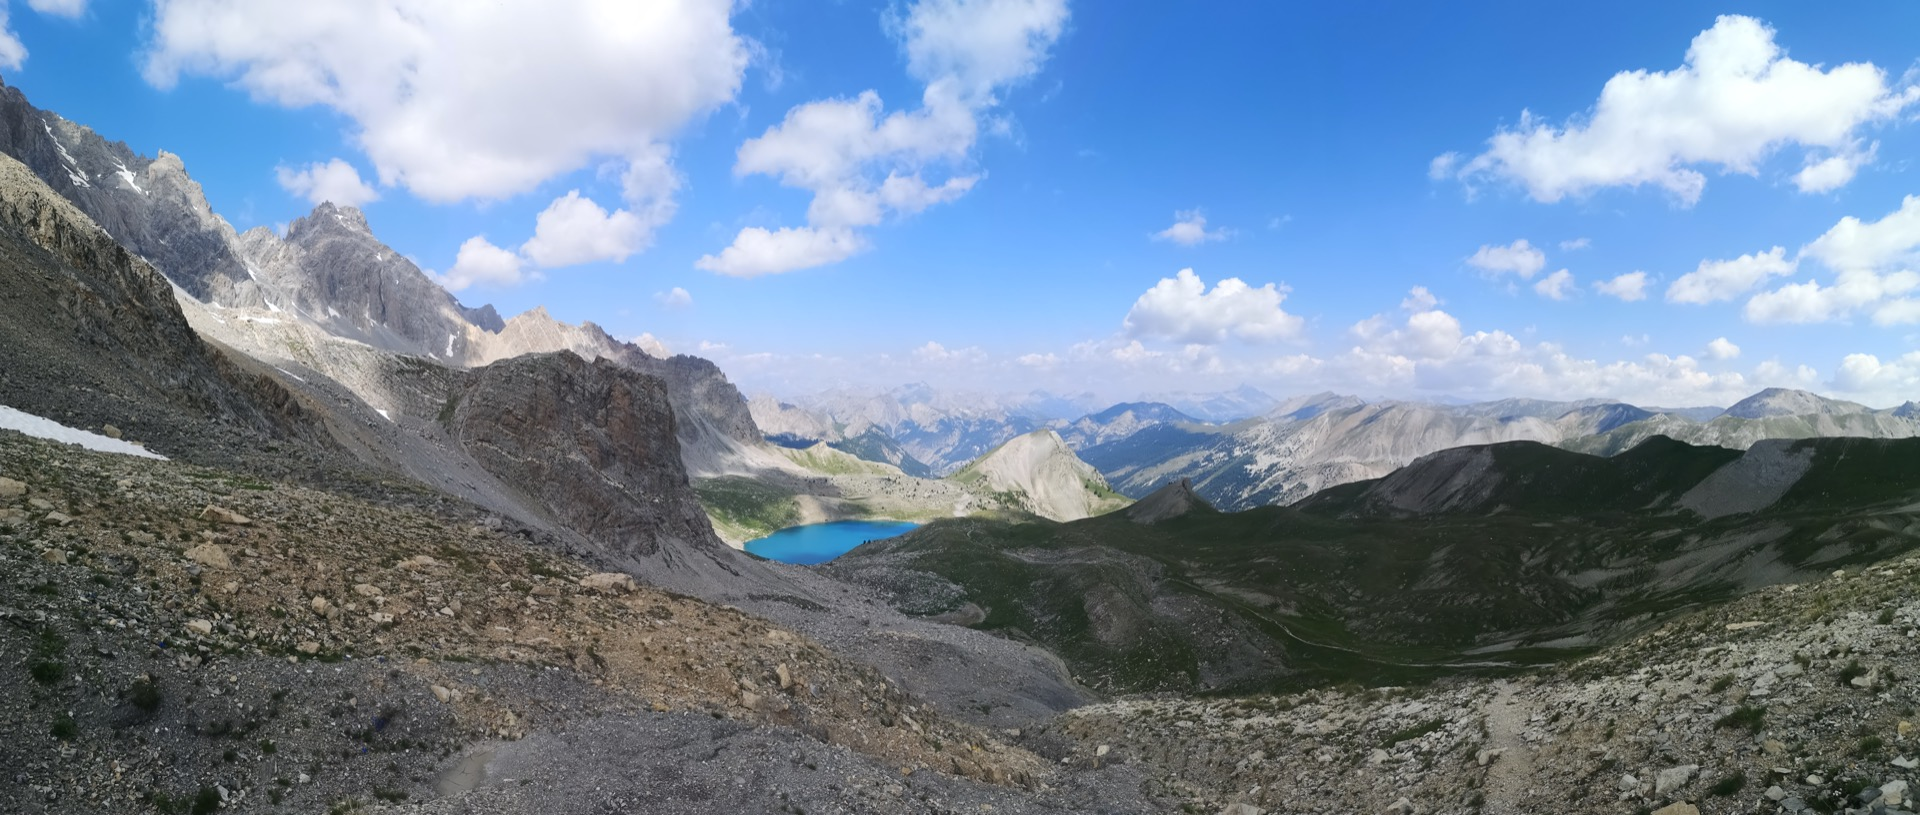 Splendide vue depuis le Col Girardin